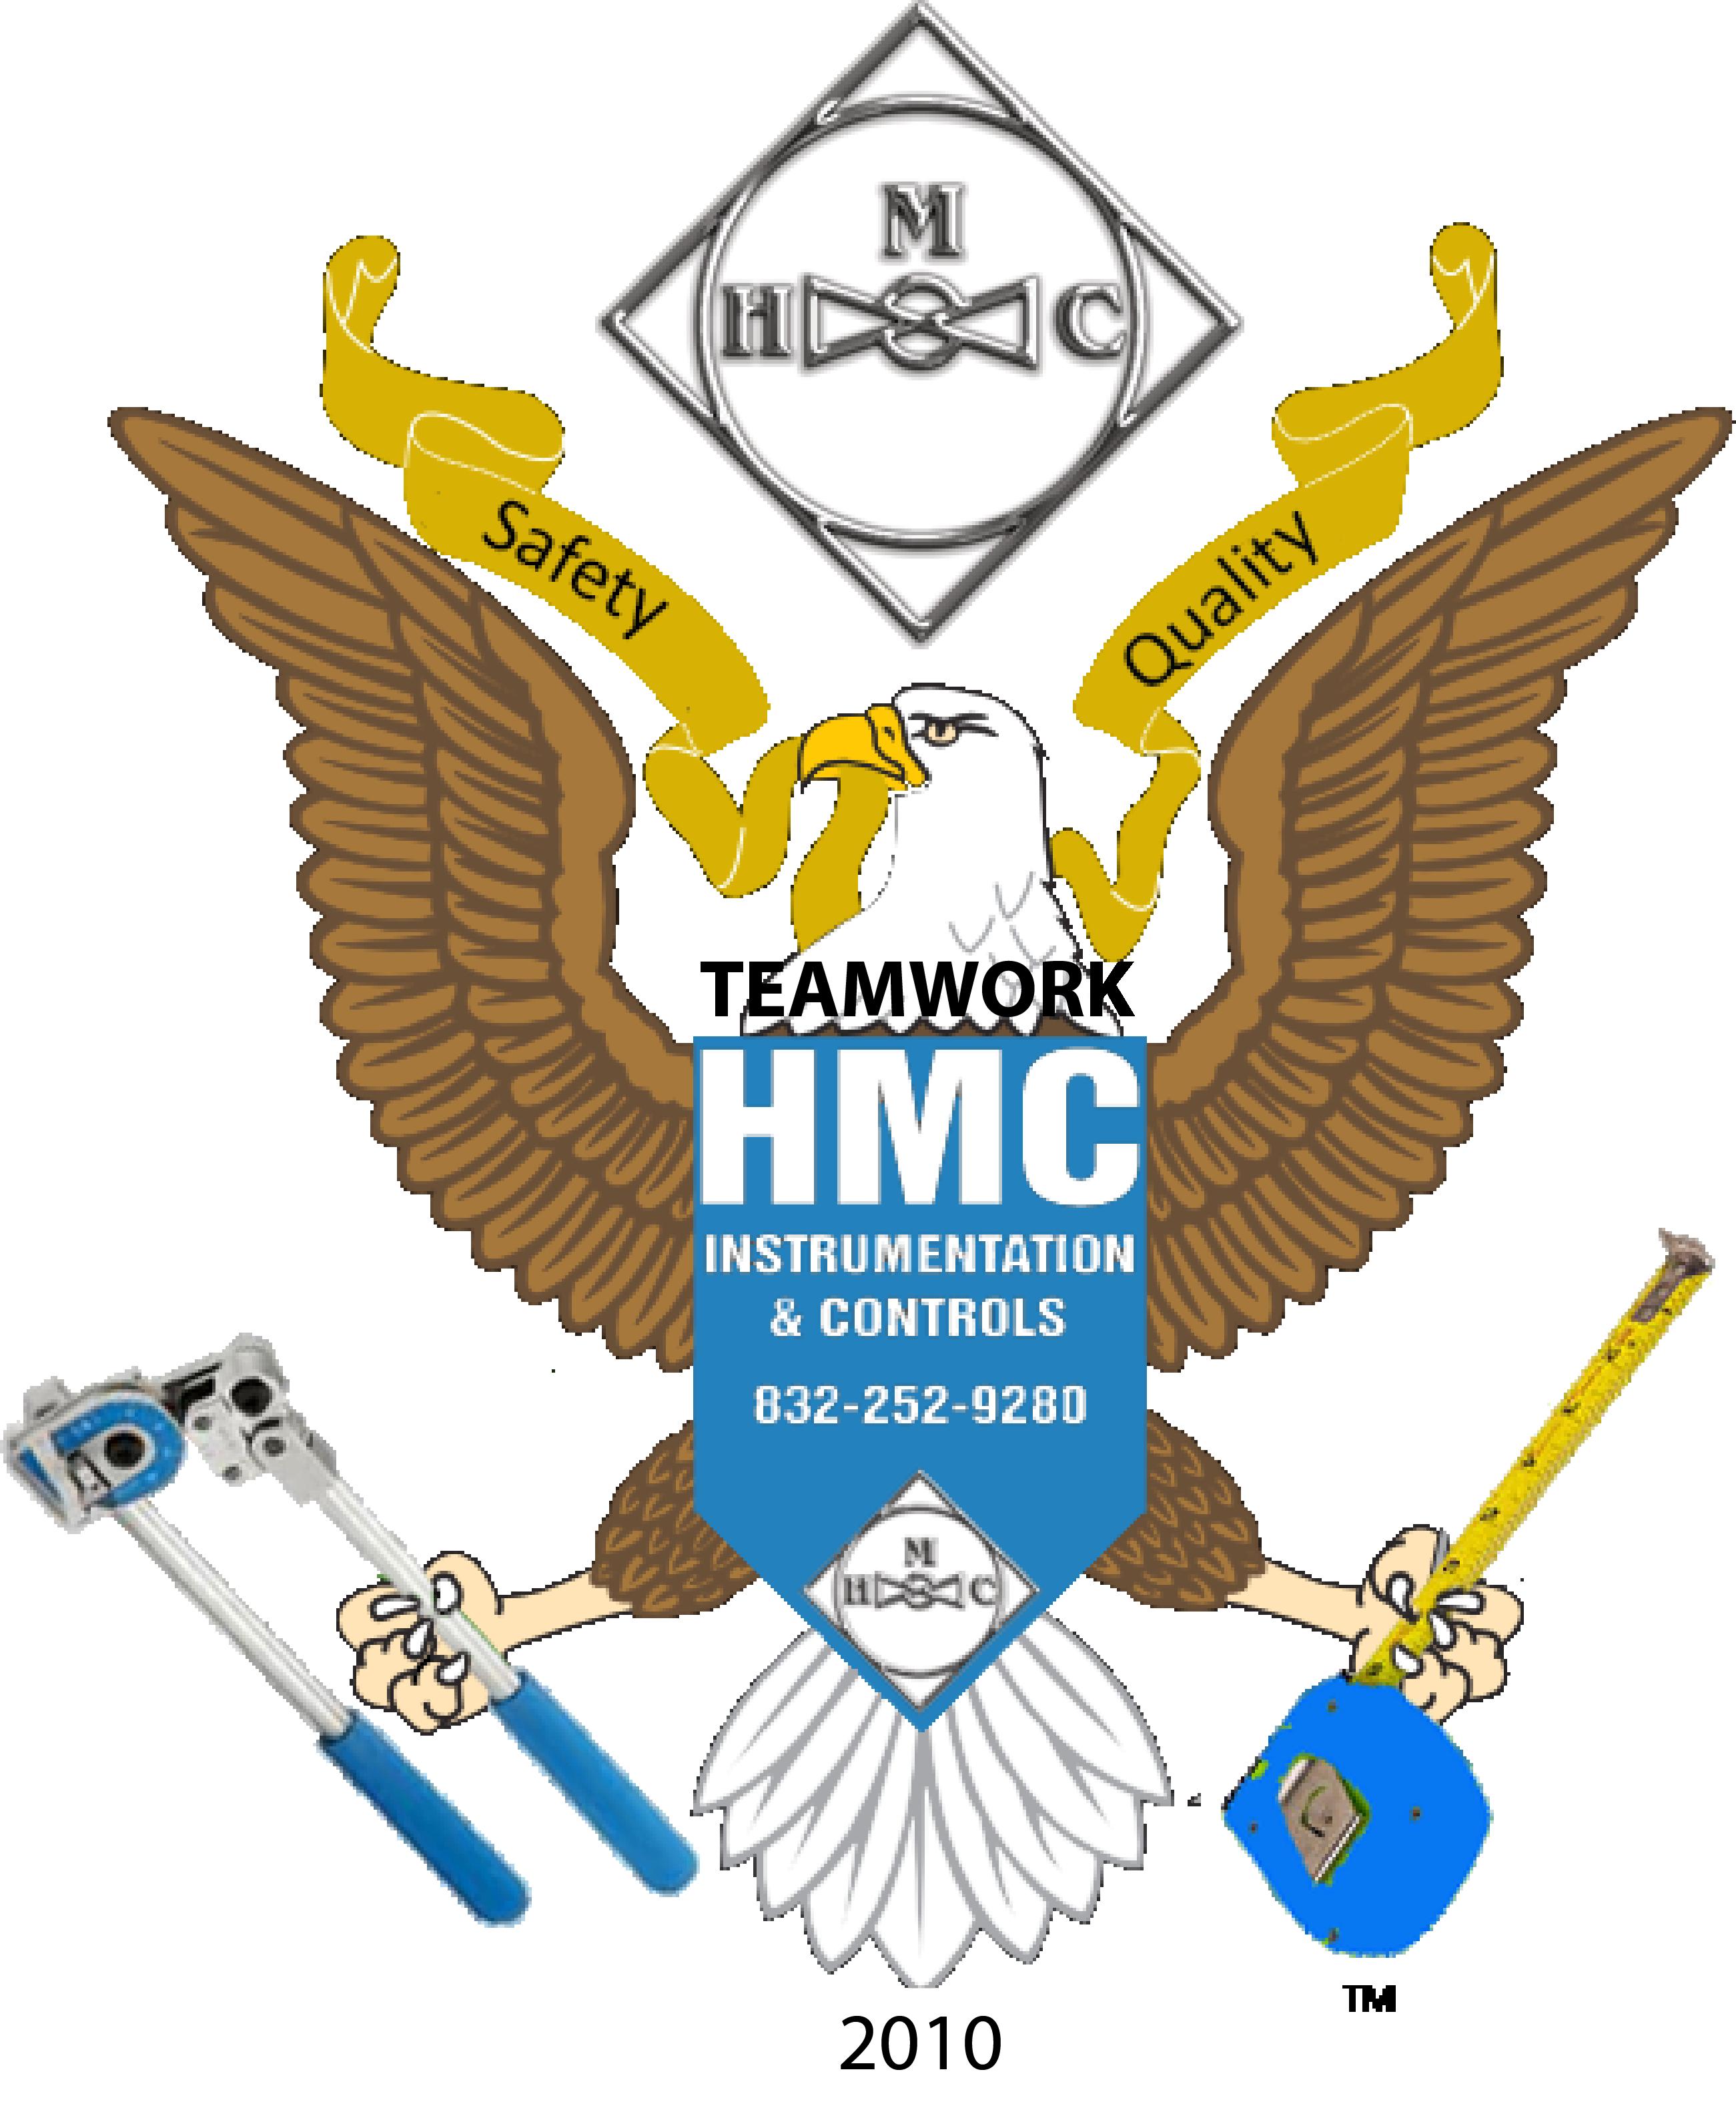 HMC pneumatic hydraulic controls experts